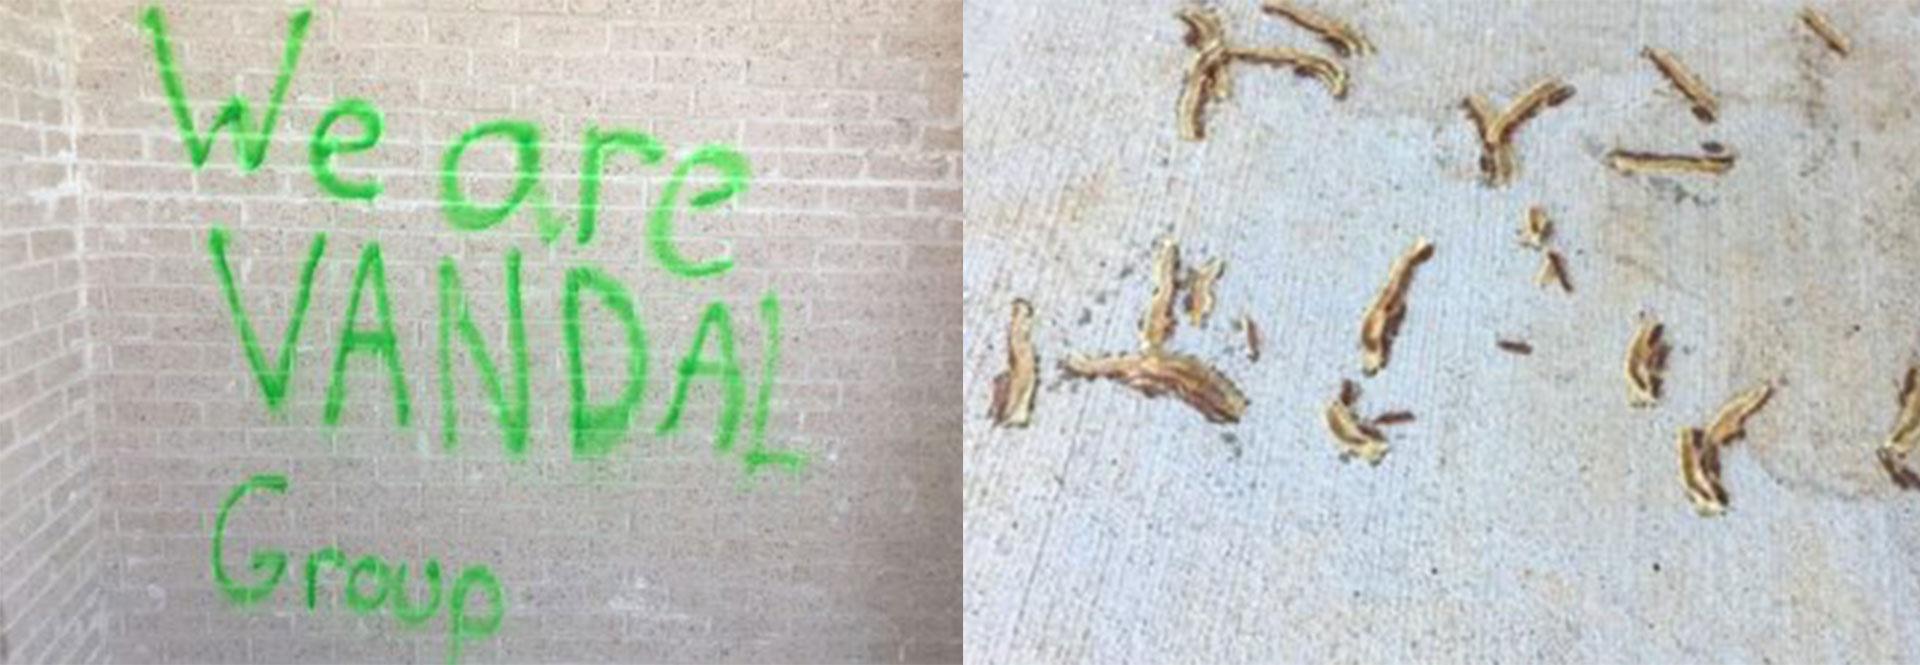 RUCO-mosque-vandalism_1525910754296.jpg